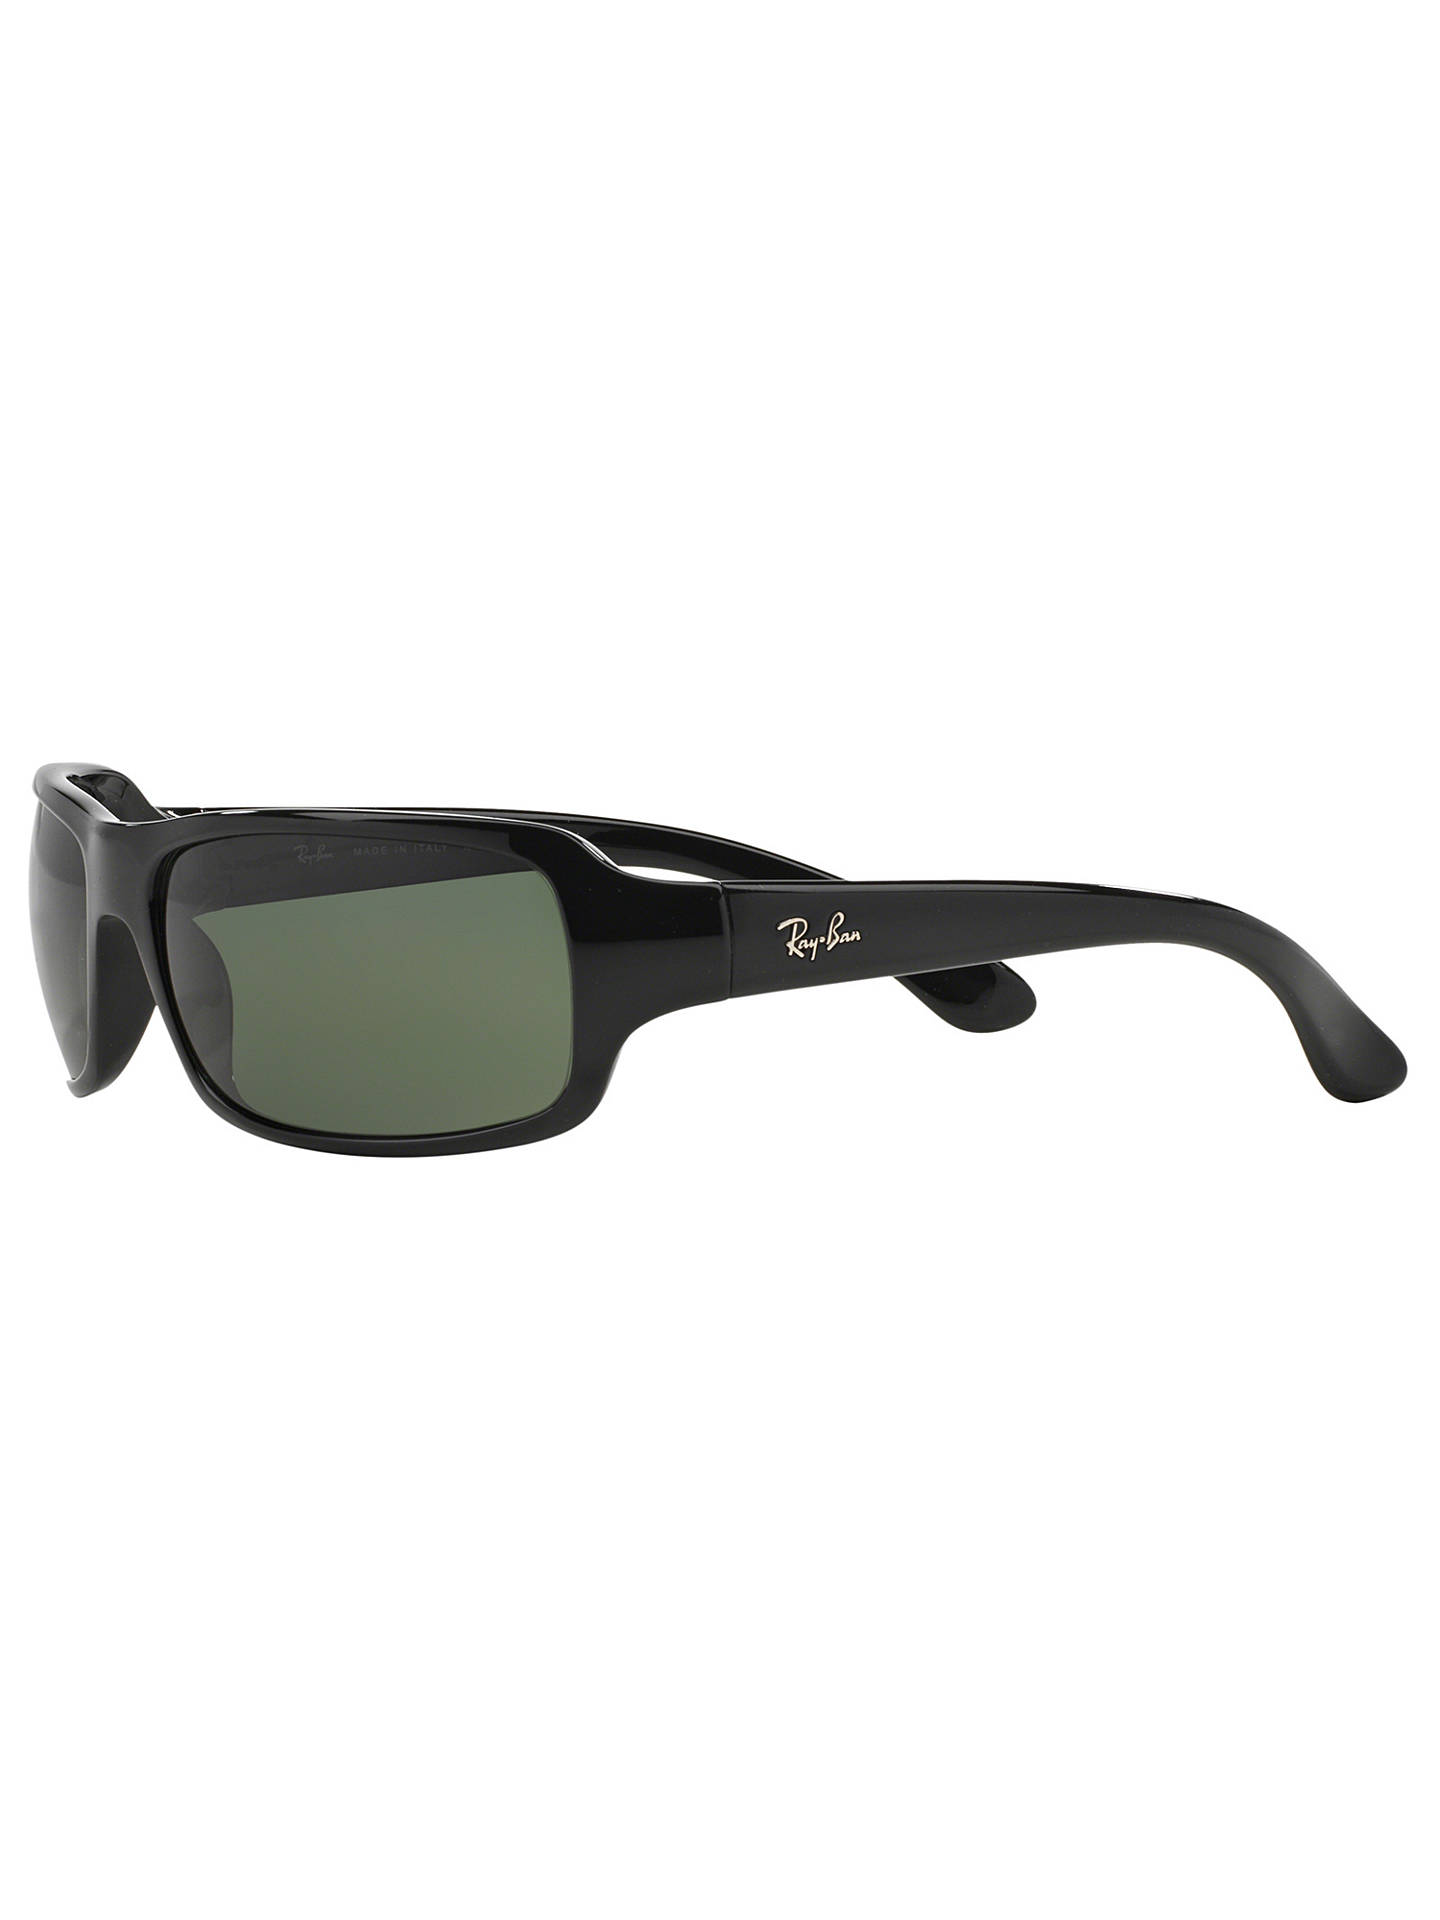 b0844ba005e ... get buyray ban rb4075 polarised rectangular sunglasses black dark green  online at johnlewis. e2368 c7fbe